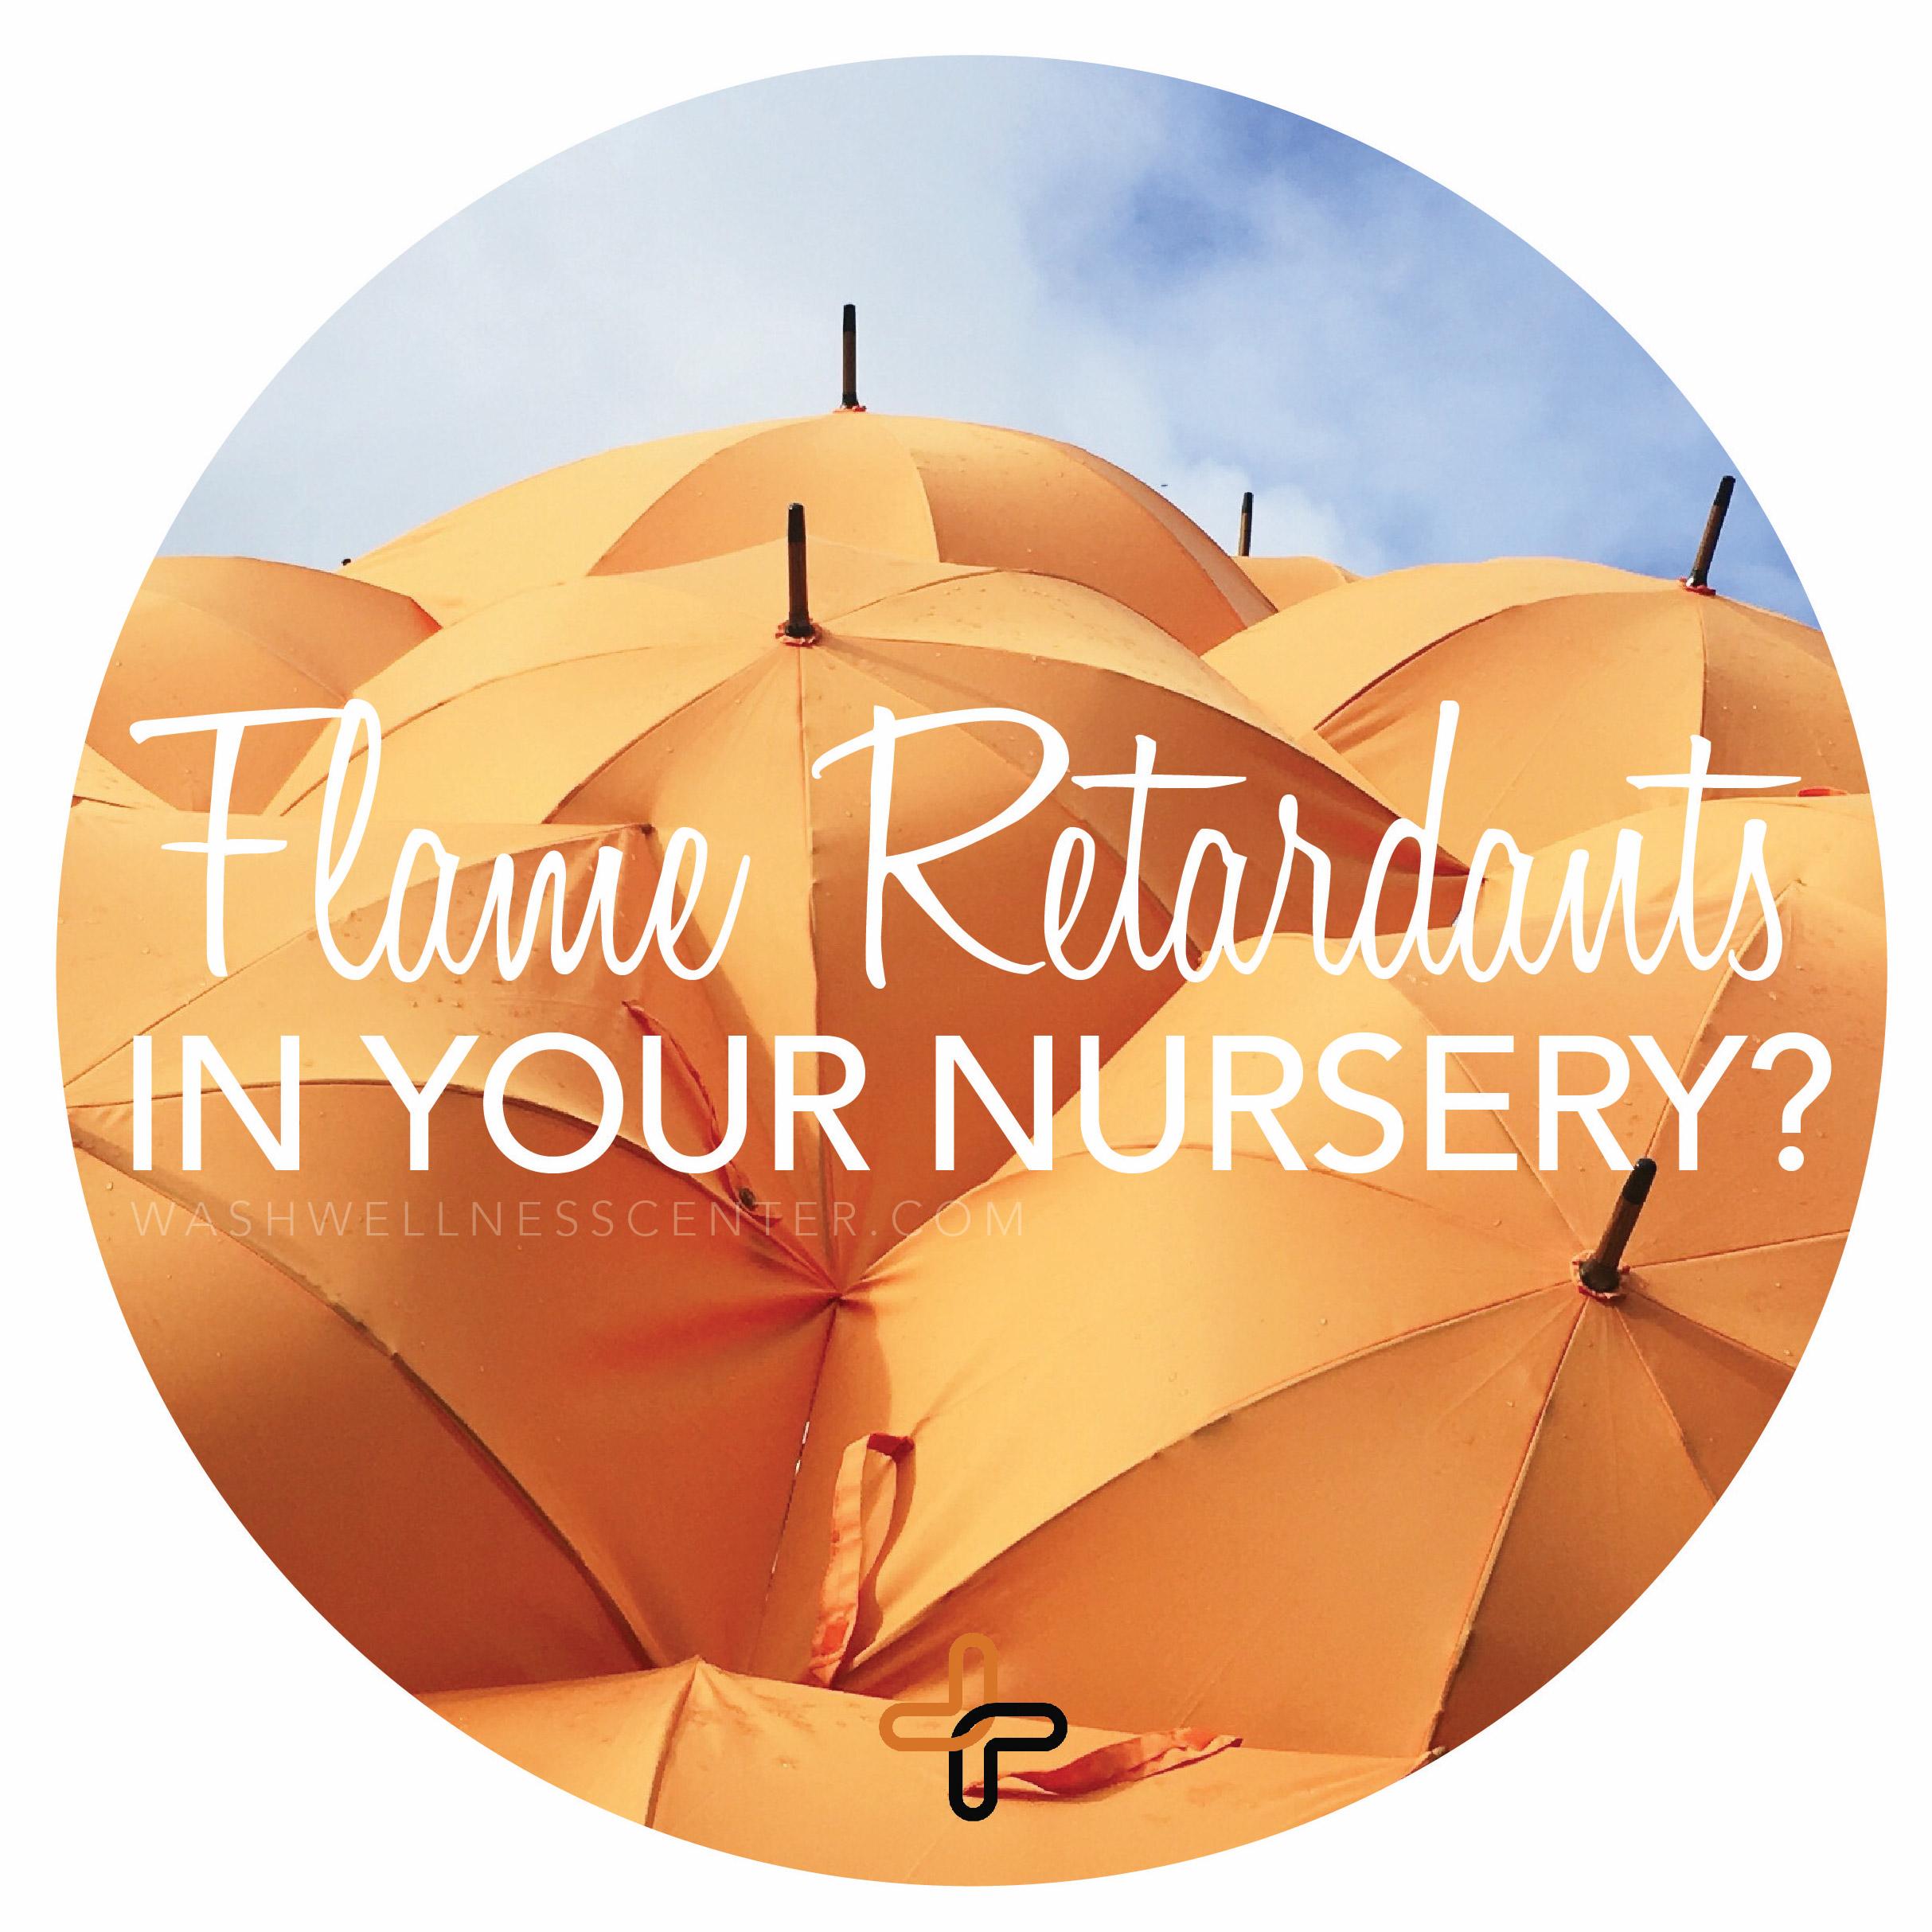 FLAME+RETARDANTS+IN+YOUR+NURSERY.jpg